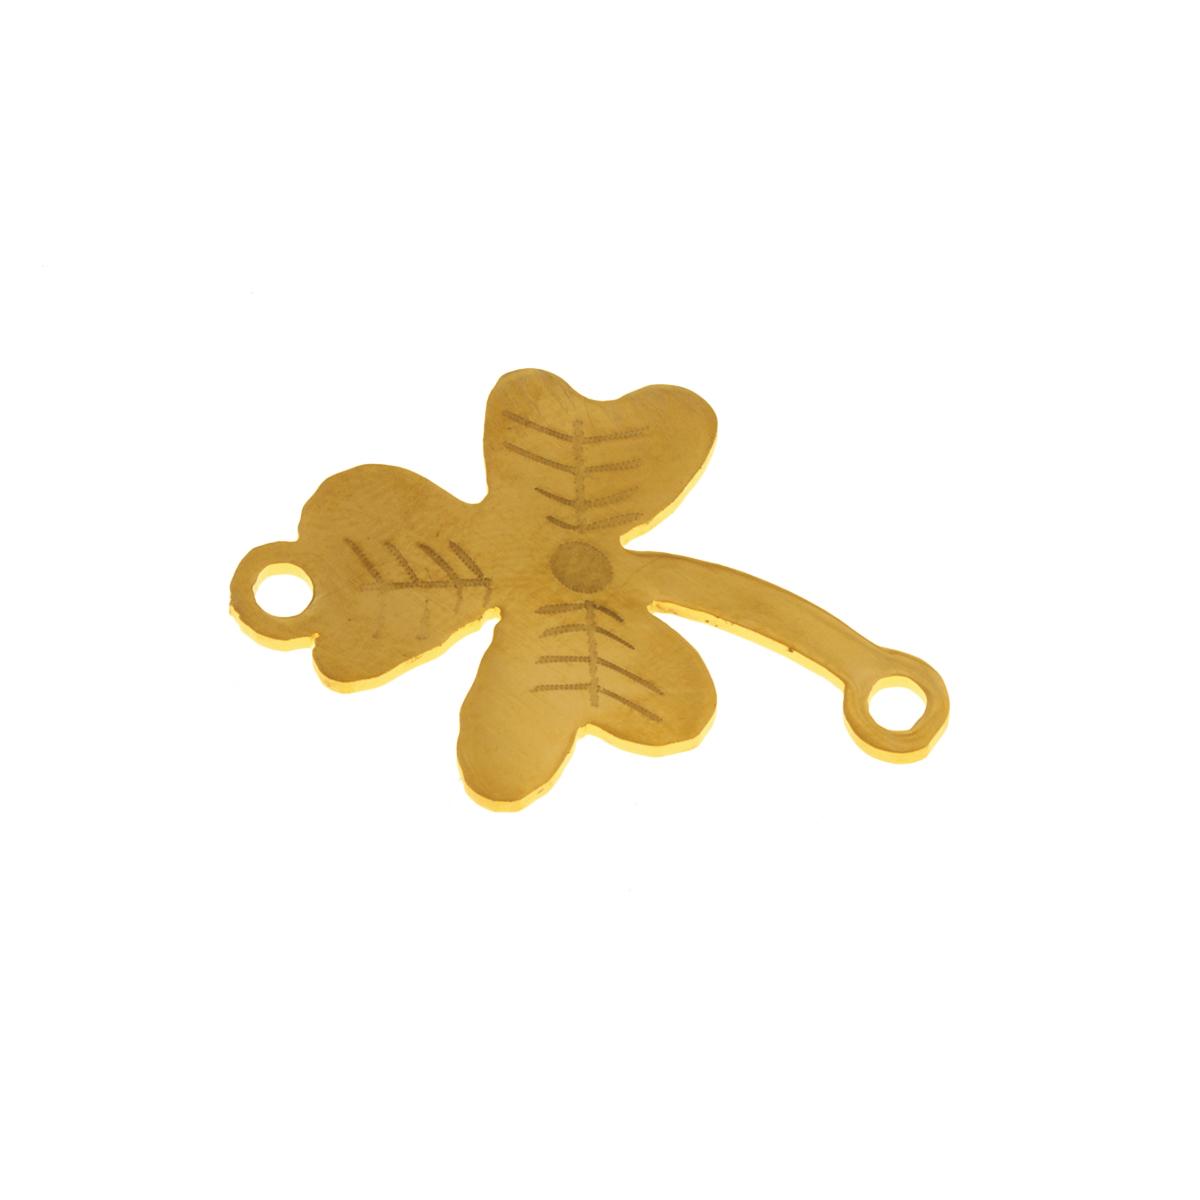 پلاک دستبند طرح گل شبدر کد 1275